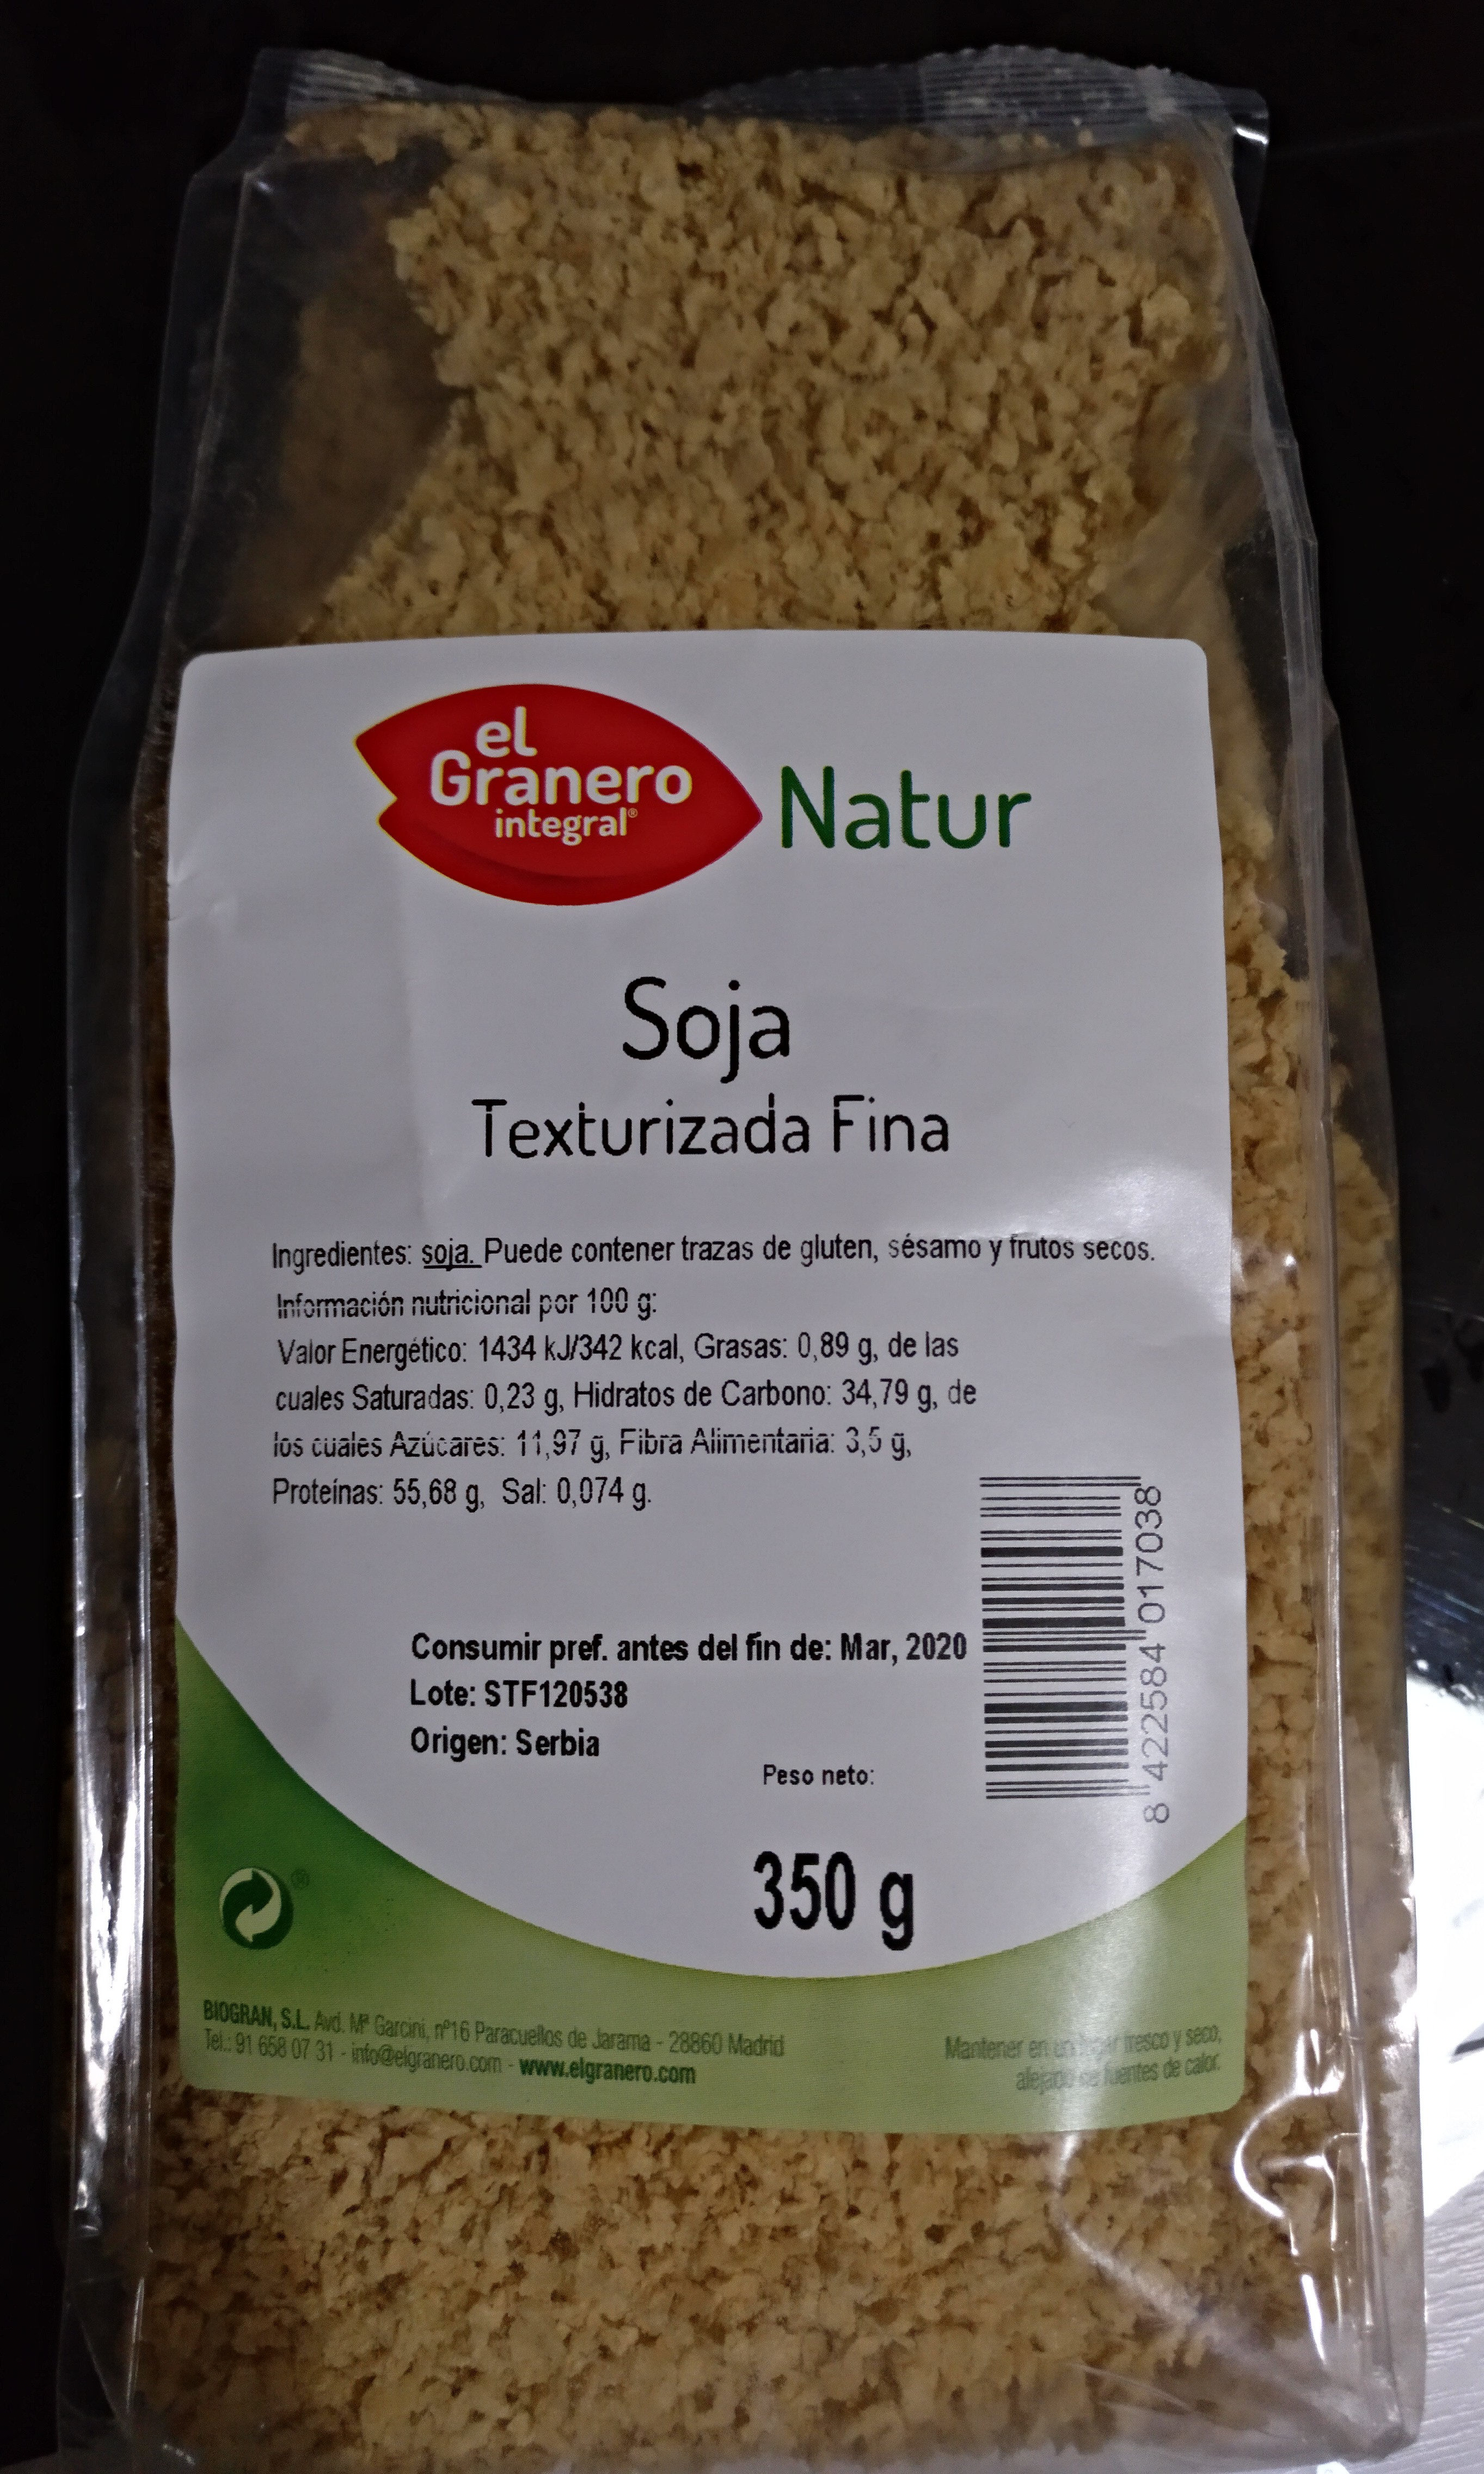 Soja Texturizada Fina - Product - es